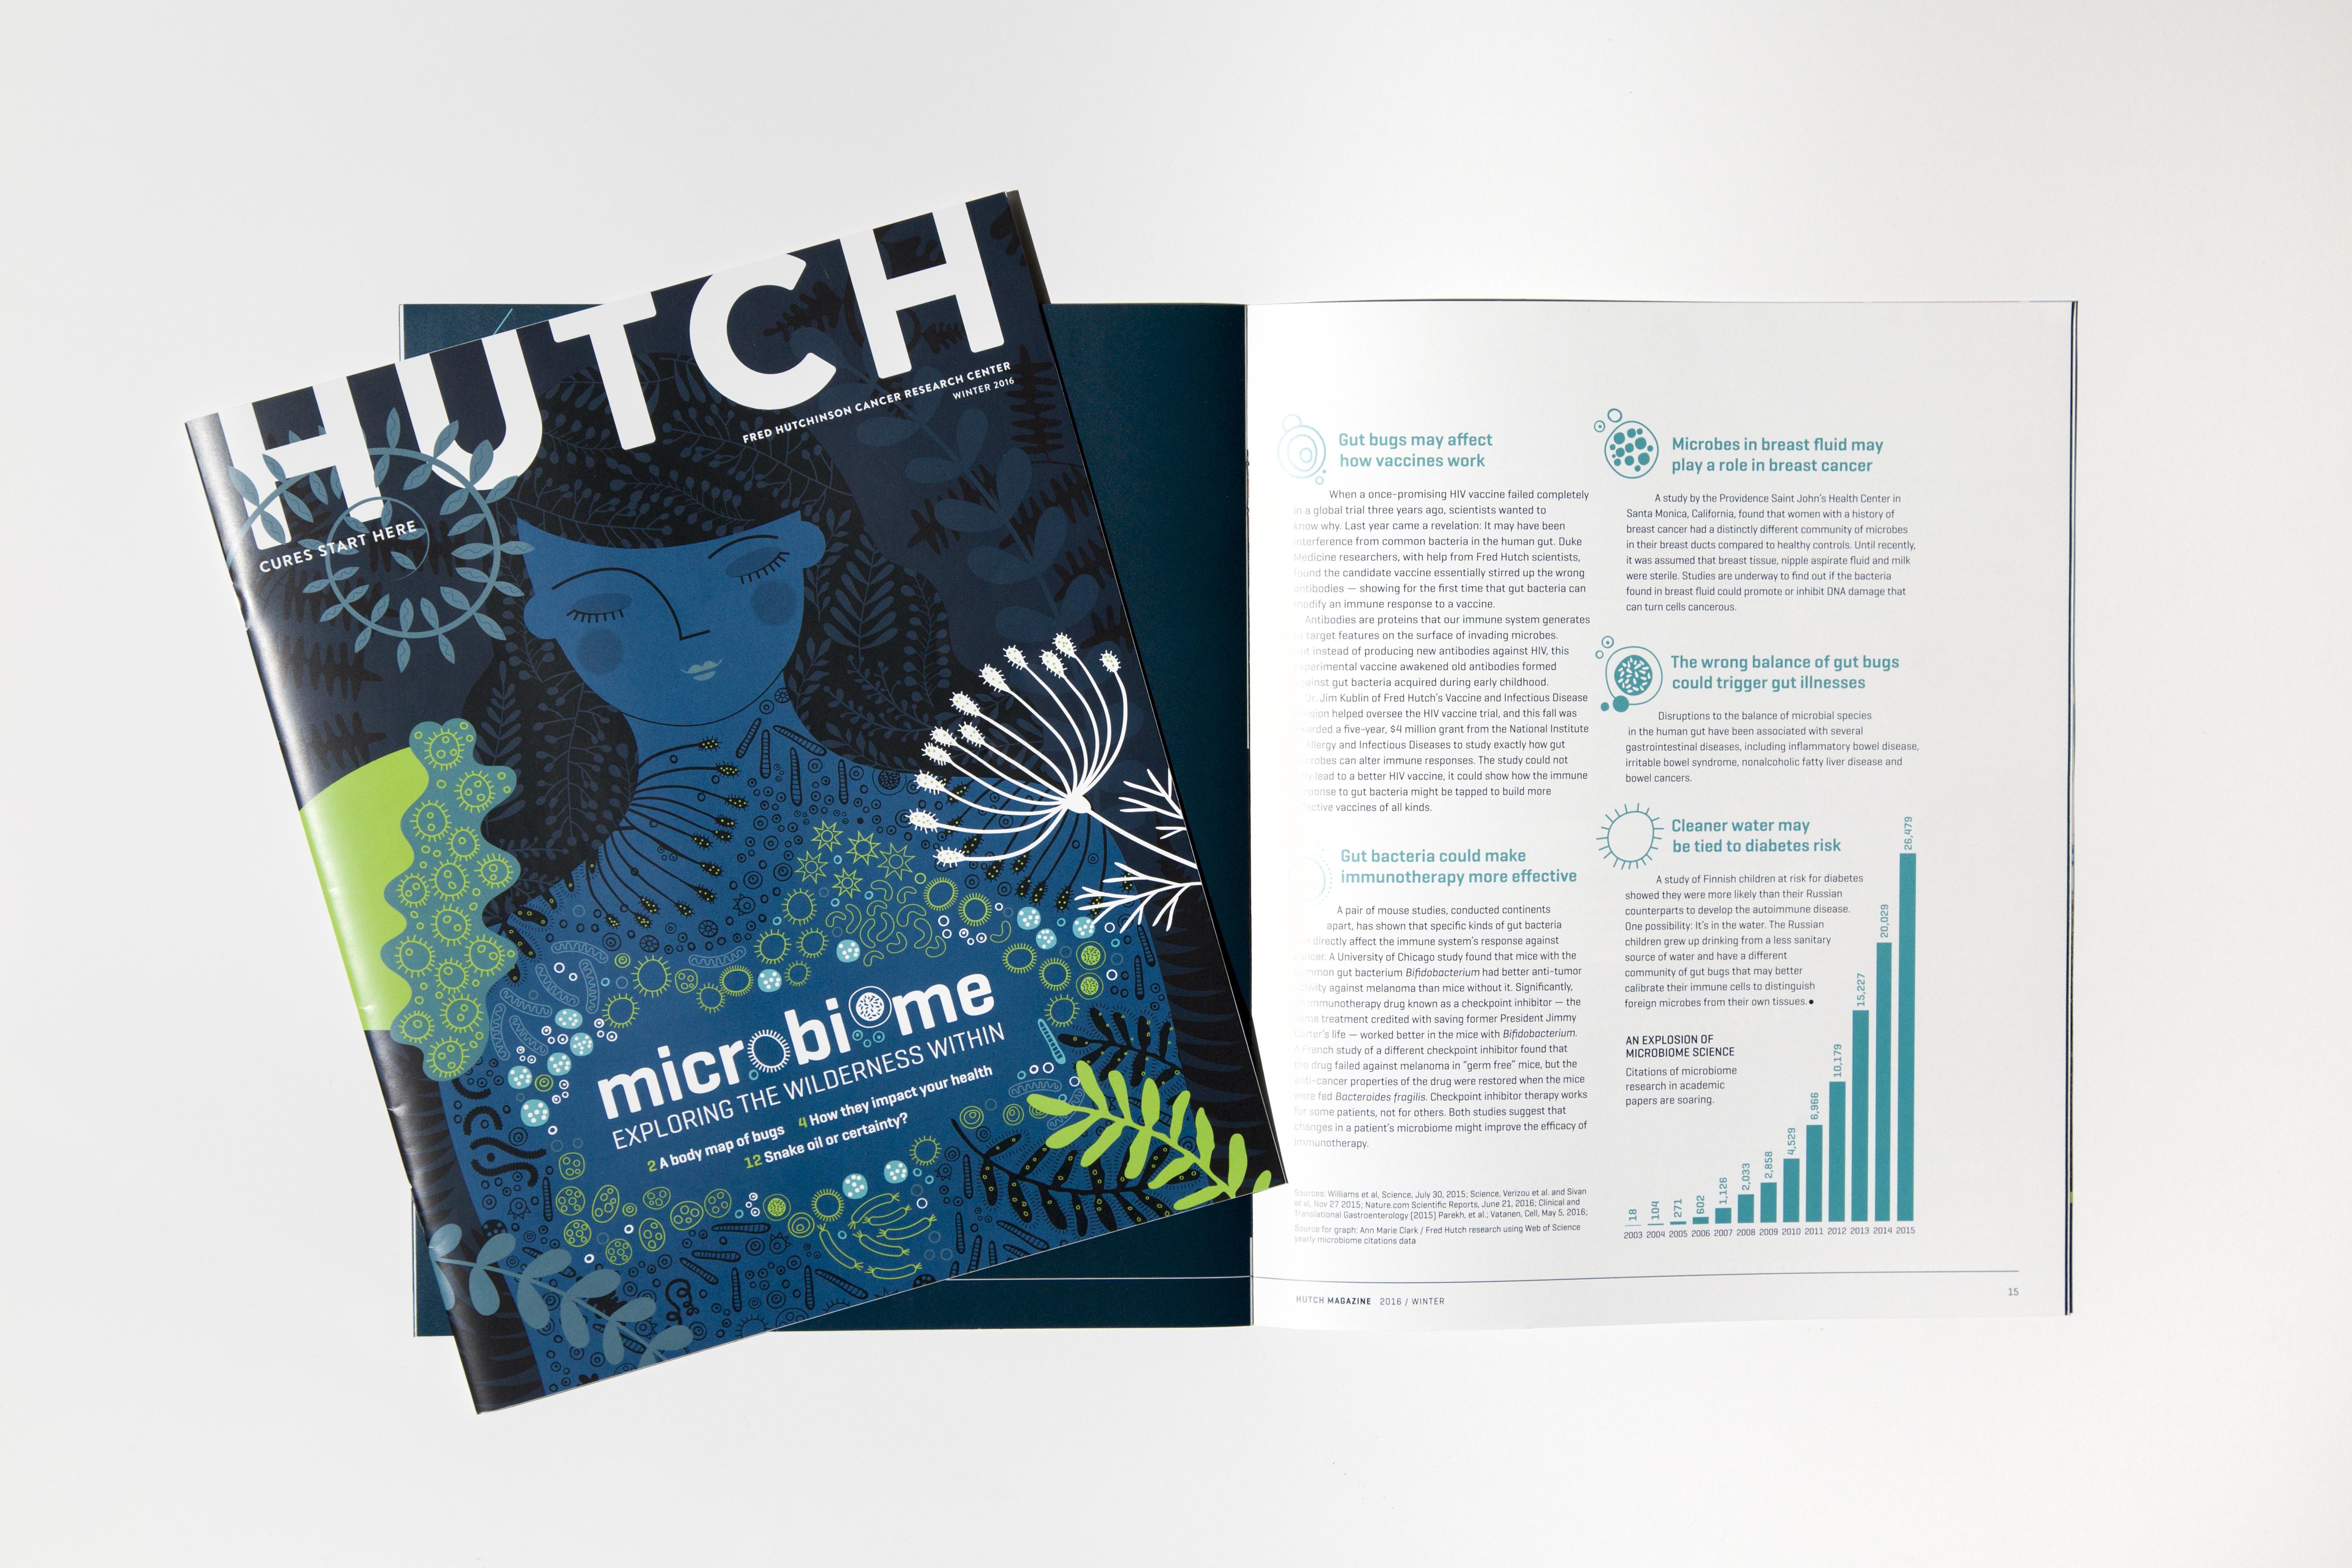 Hutch Magazine